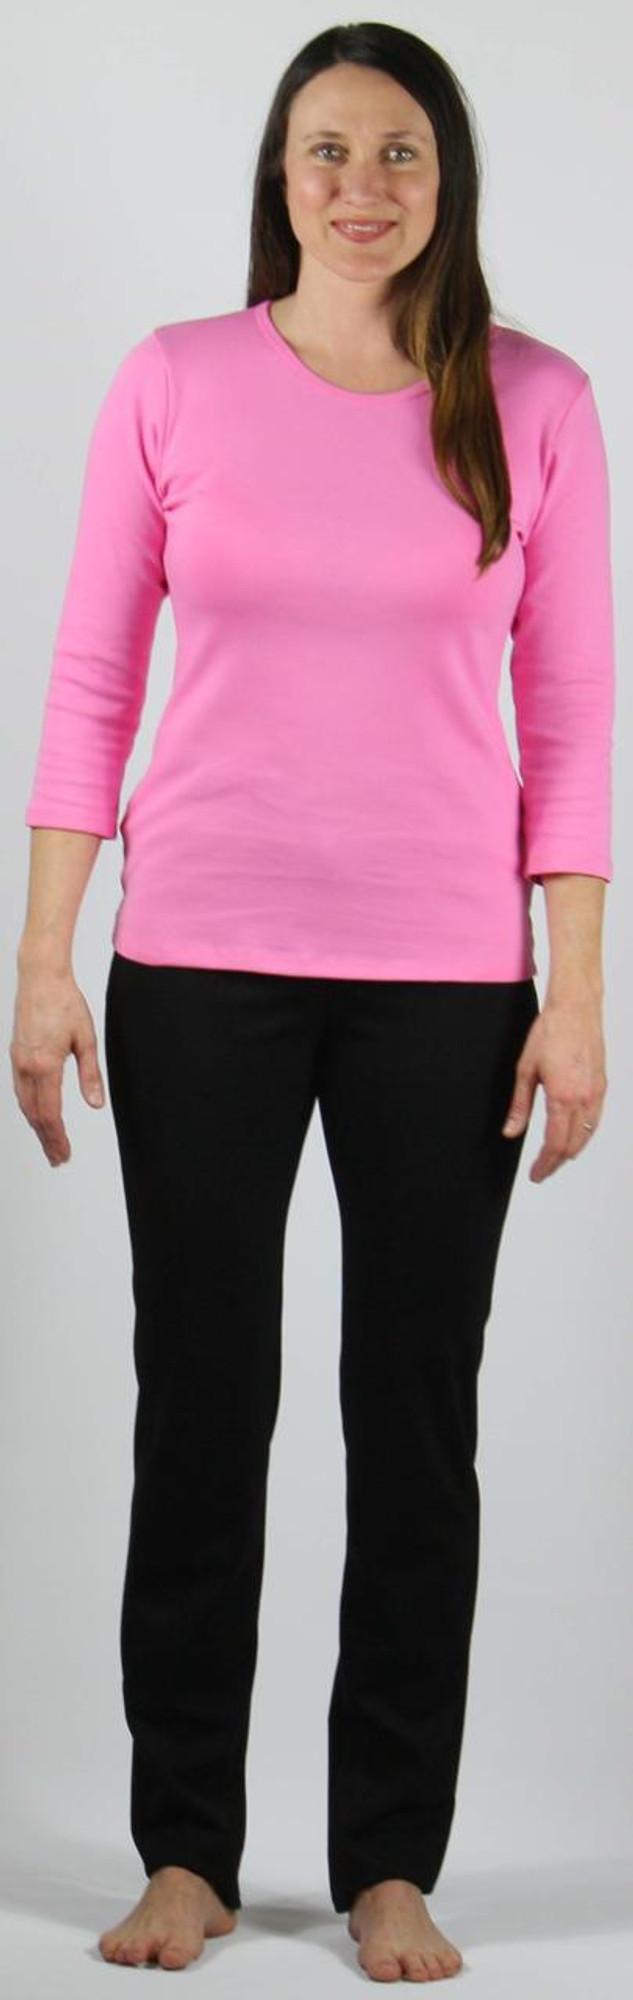 "Ponte Knit Narrow Leg Pant on 5'8"" model, size small."